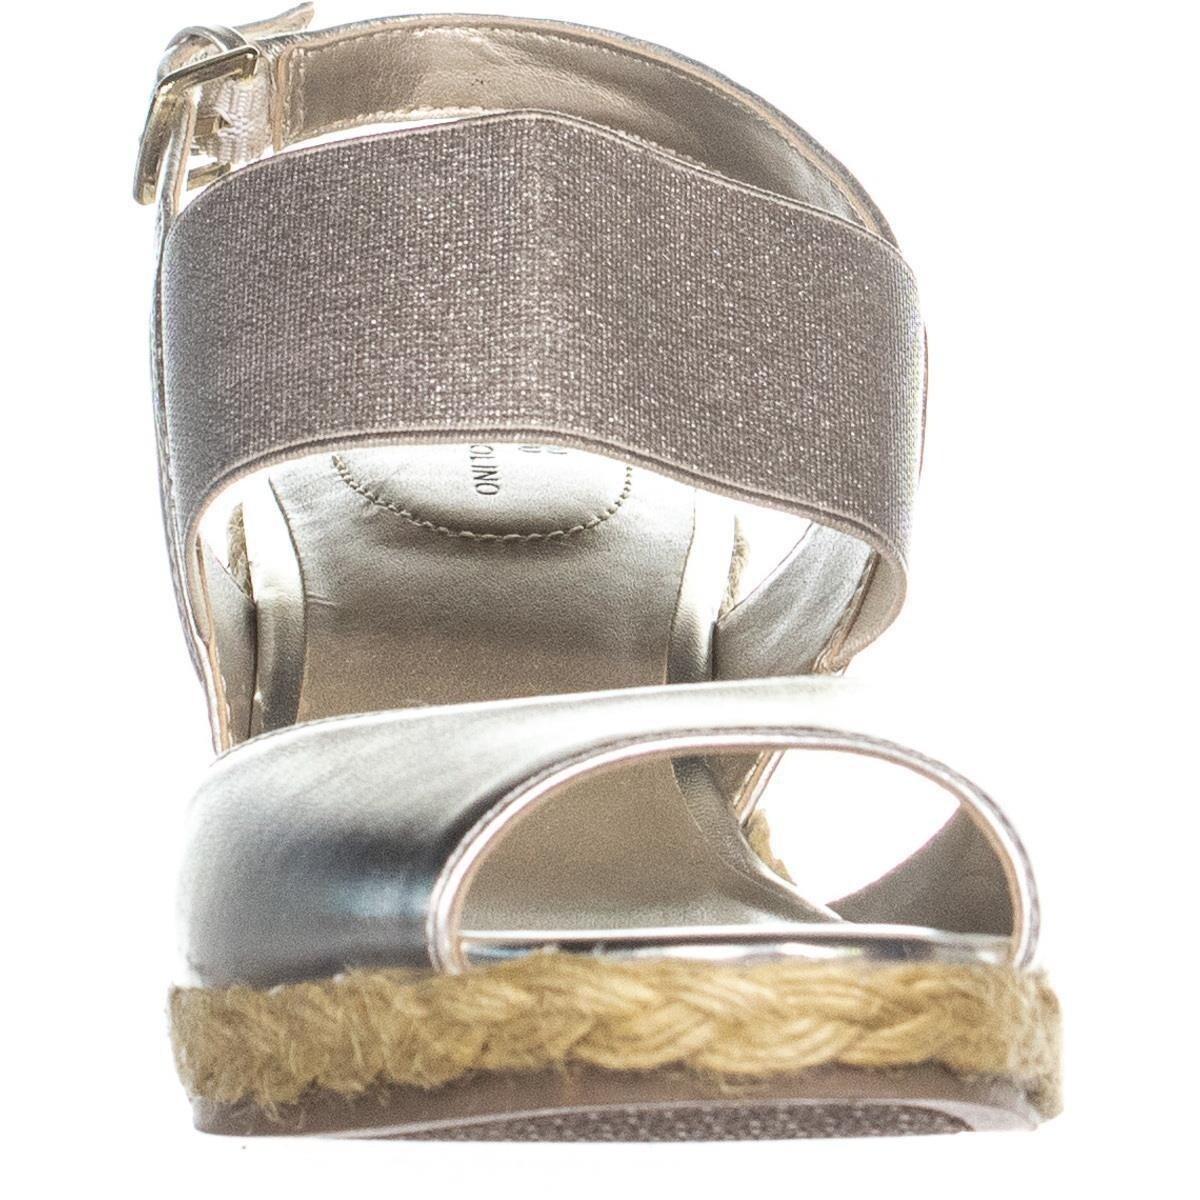 9017342e515 Bandolino Himeka Espadrilles Wedge Sandals, Light Gold/Light Gold